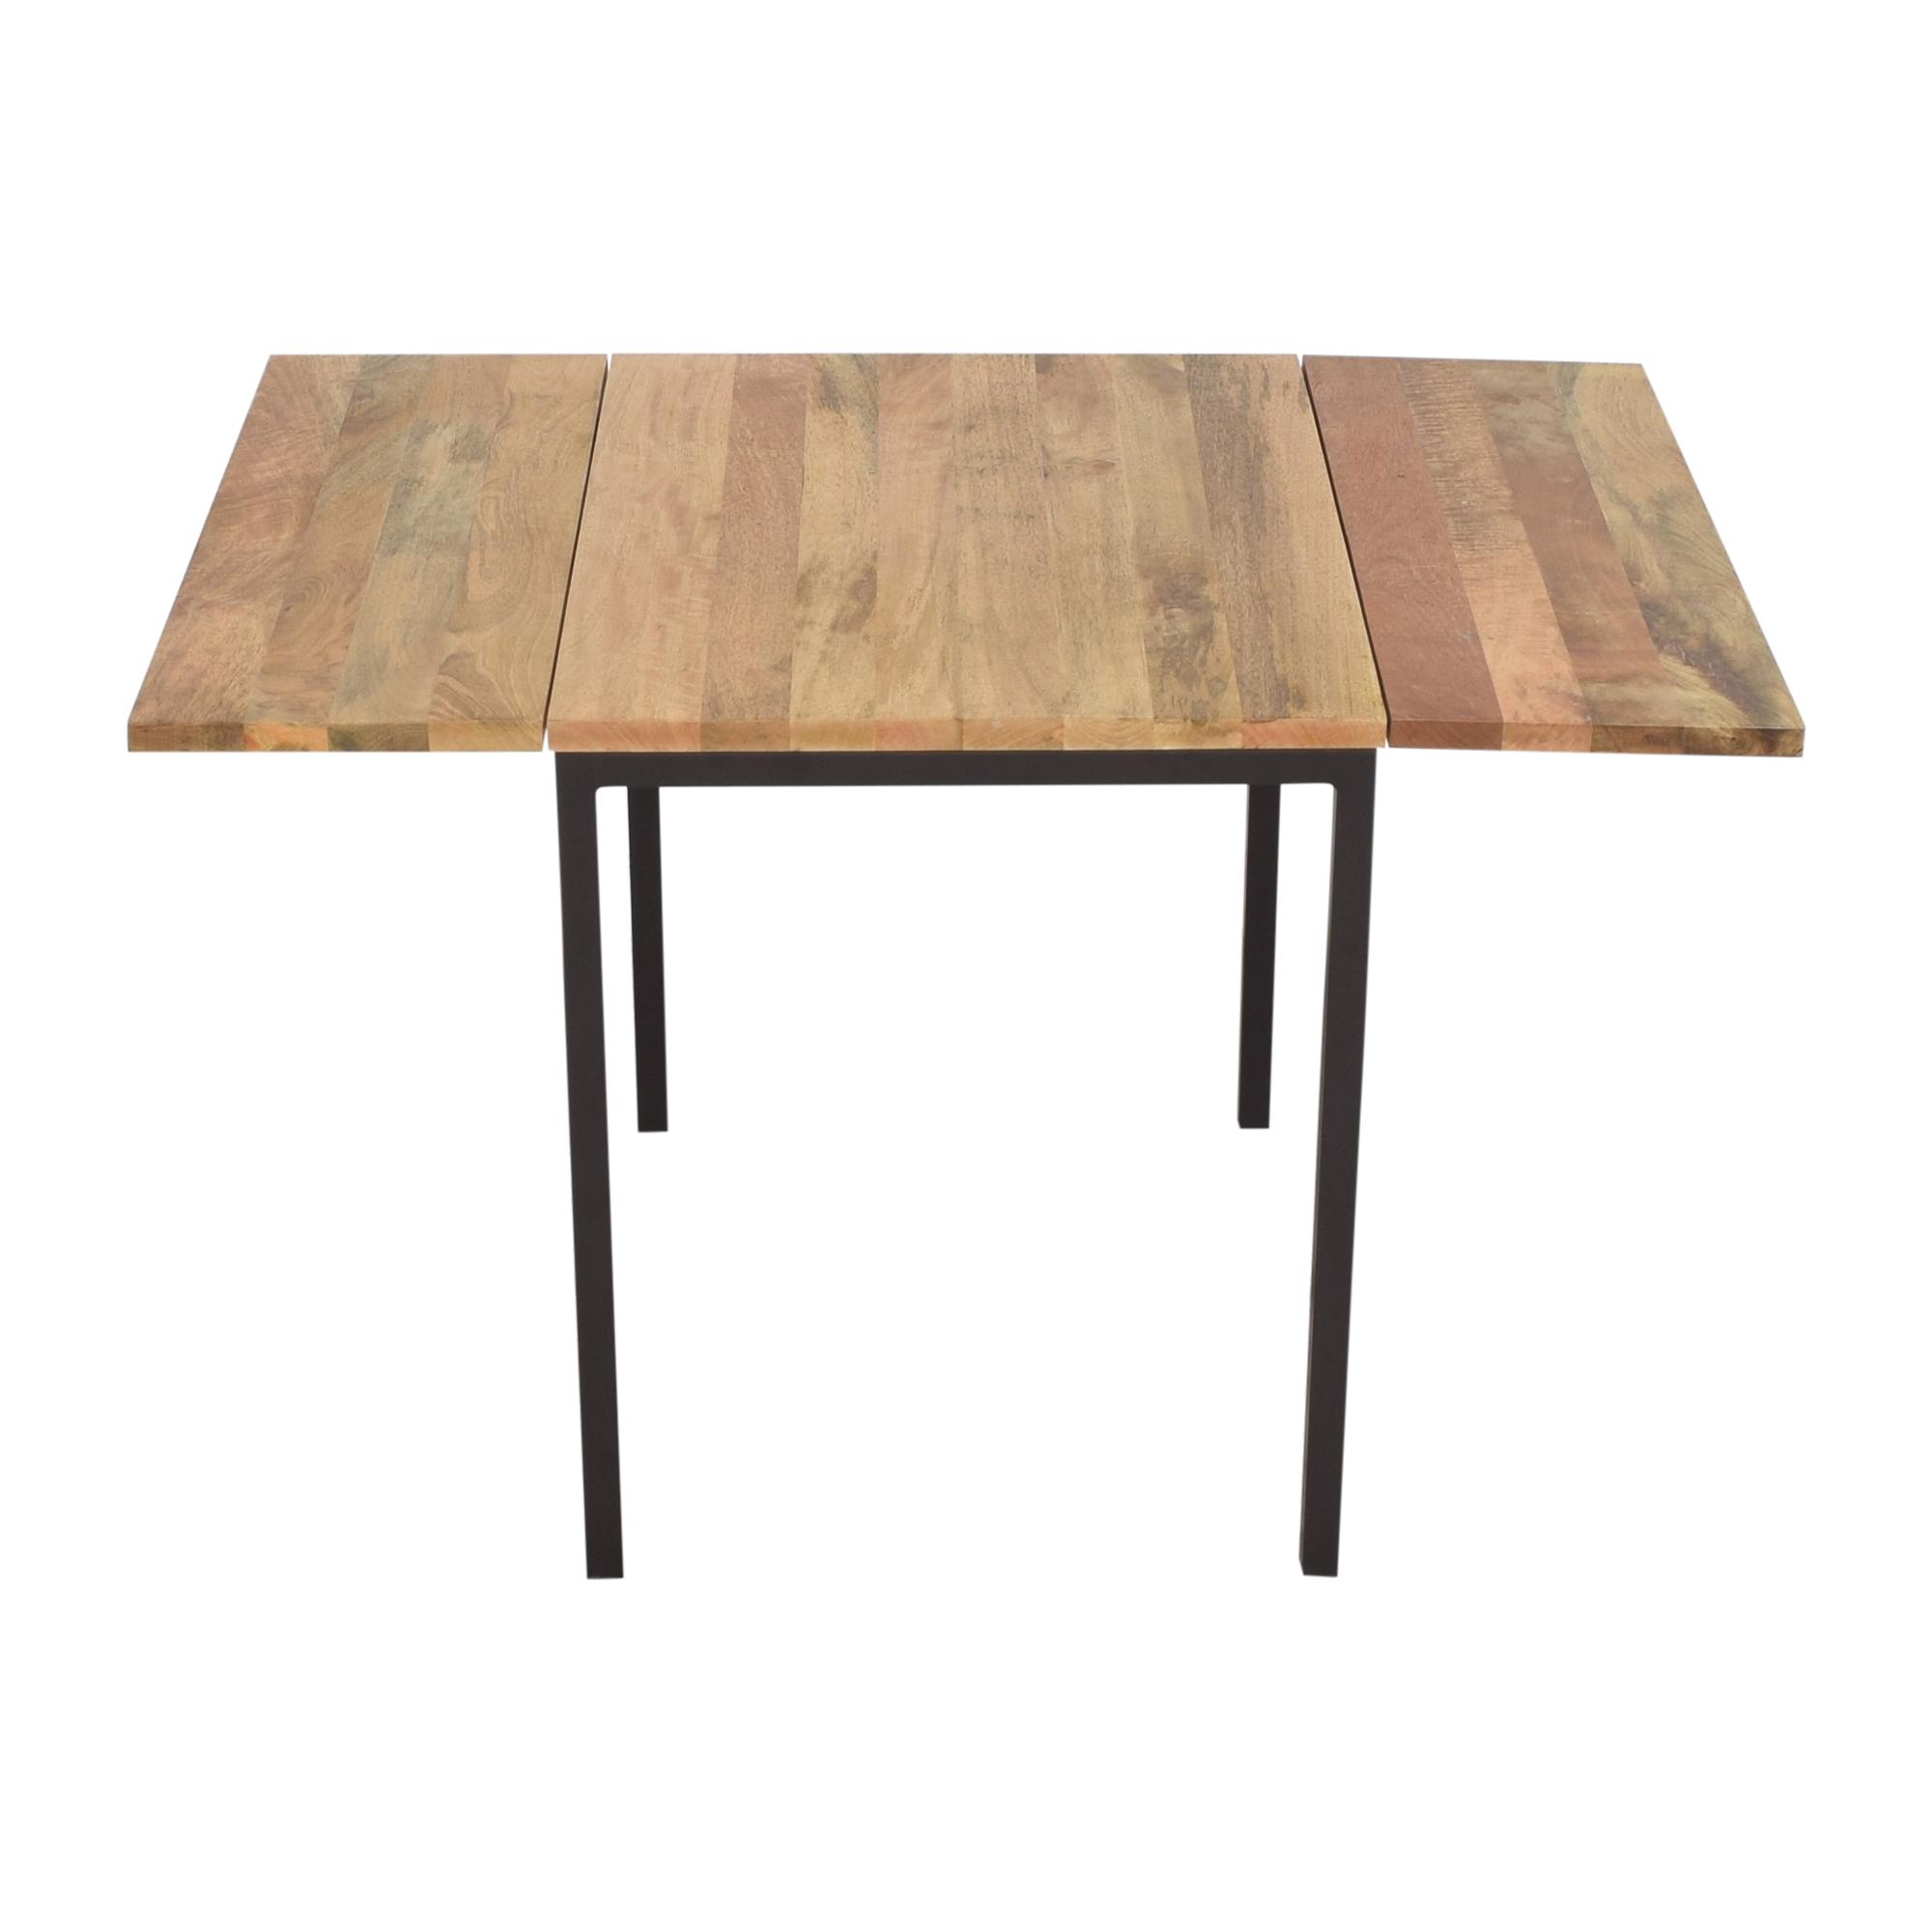 West Elm West Elm Box Frame Drop Leaf Table brown and dark gray